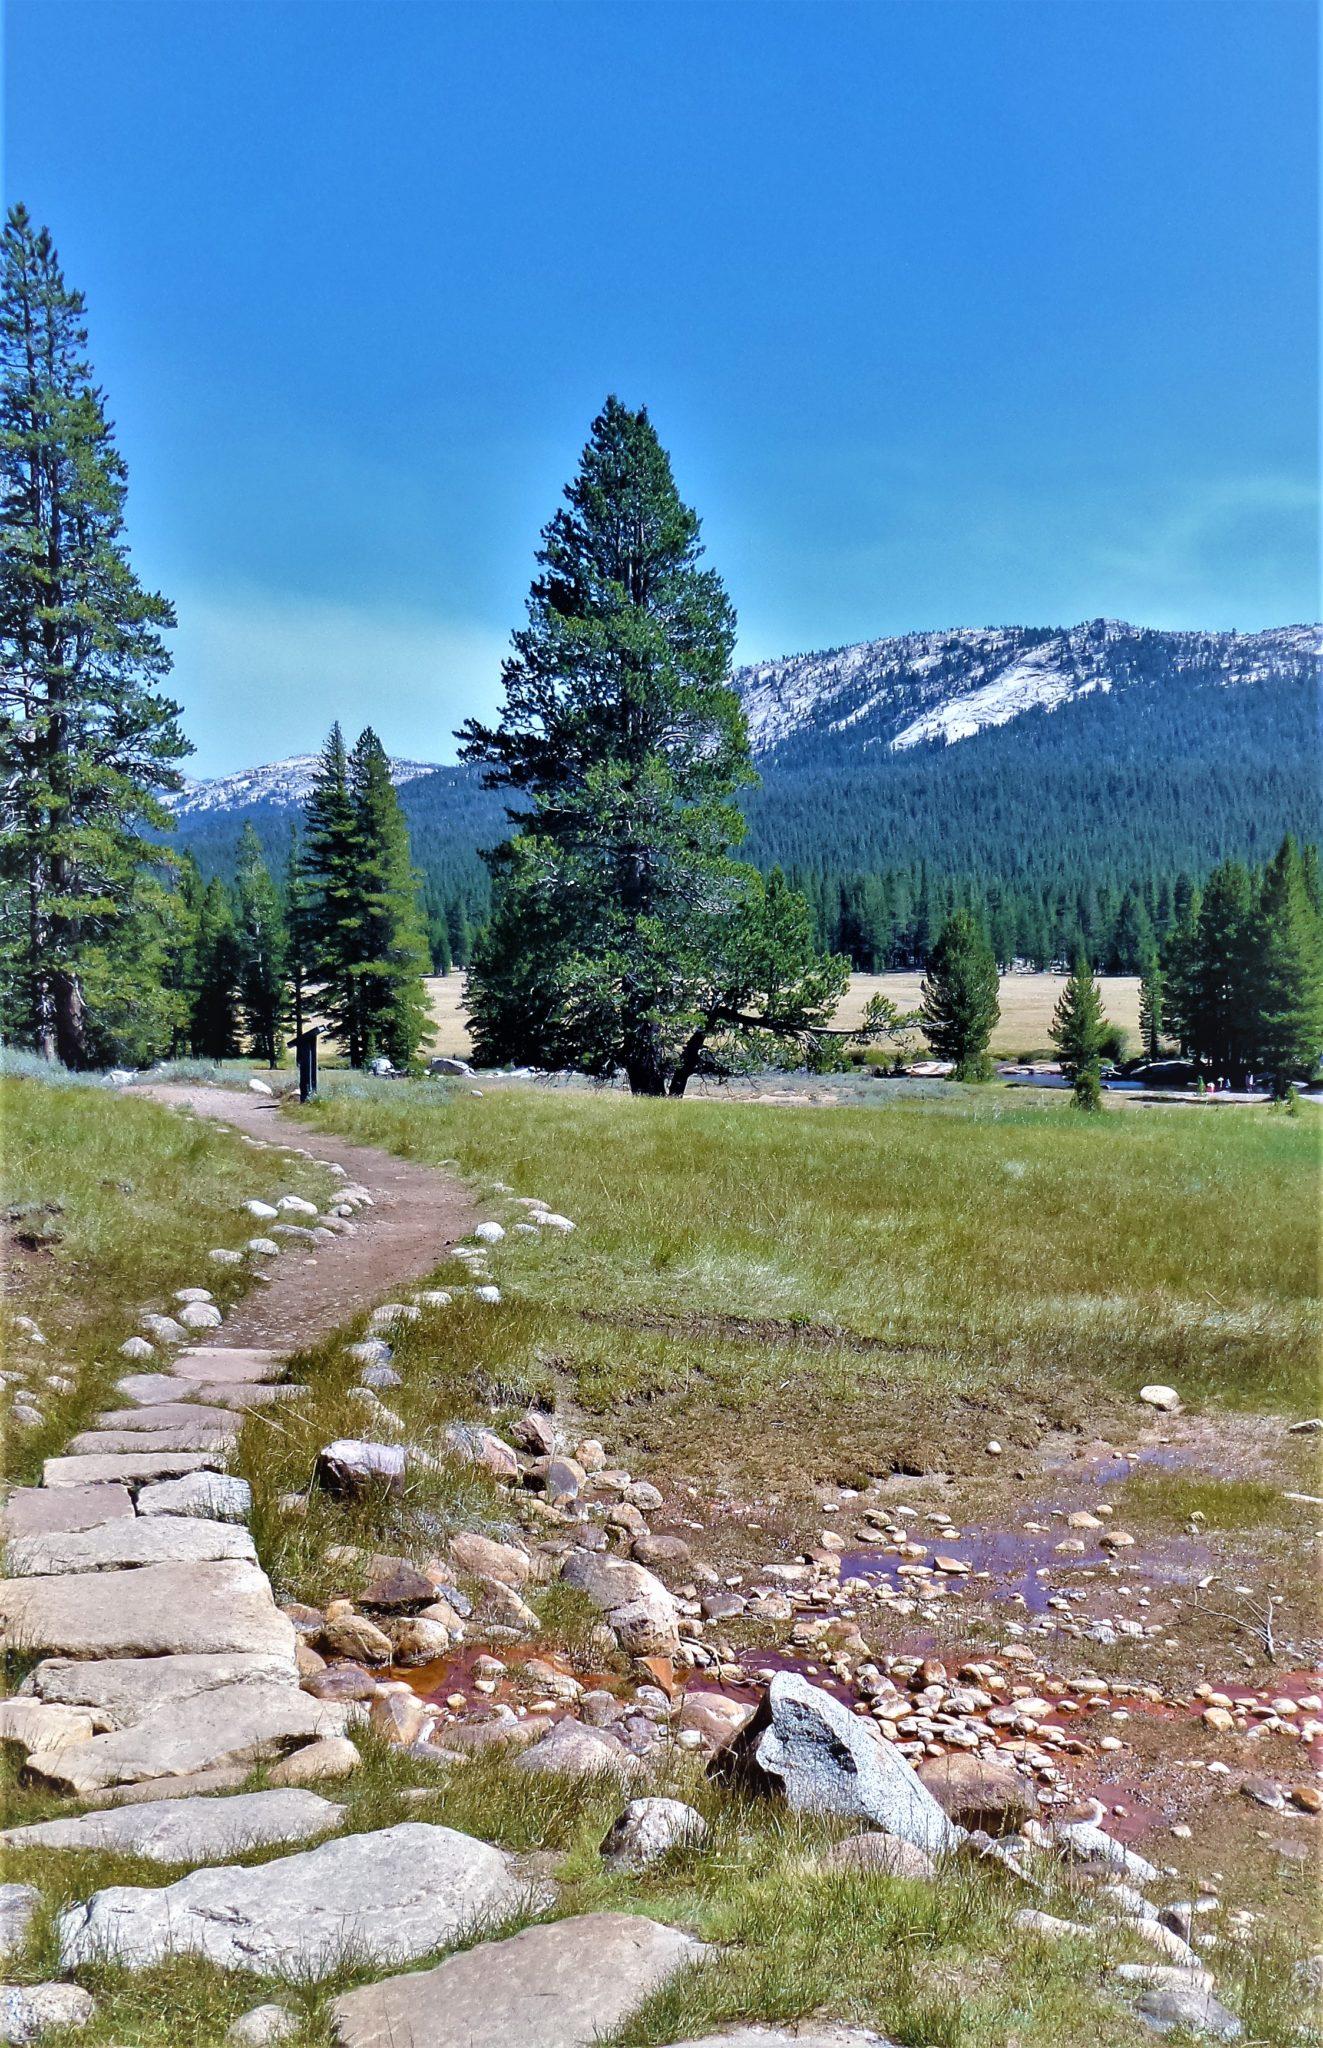 PCT path, Yosemite, California